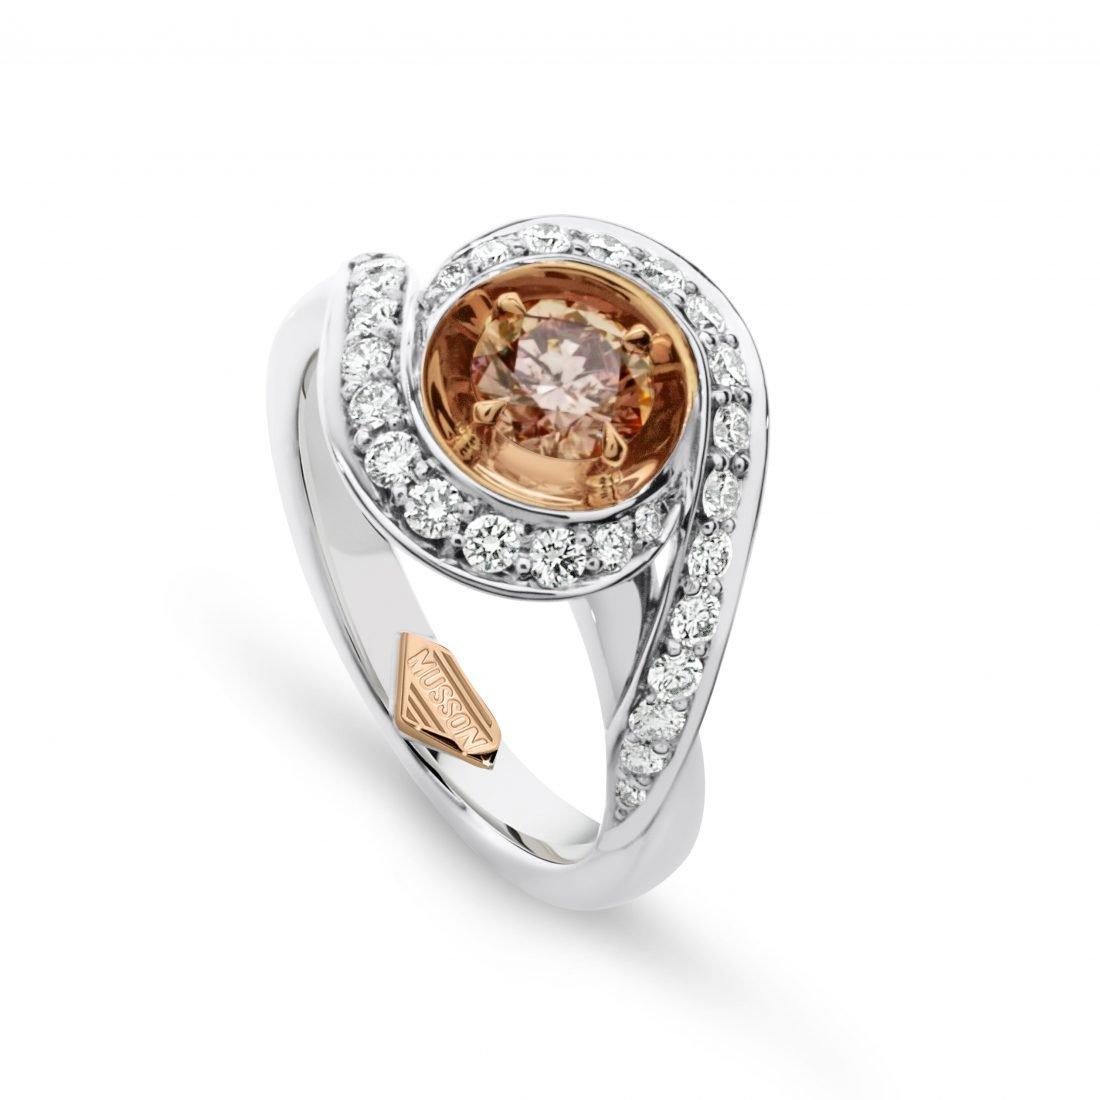 Lian Argyle Pink Diamond Ring